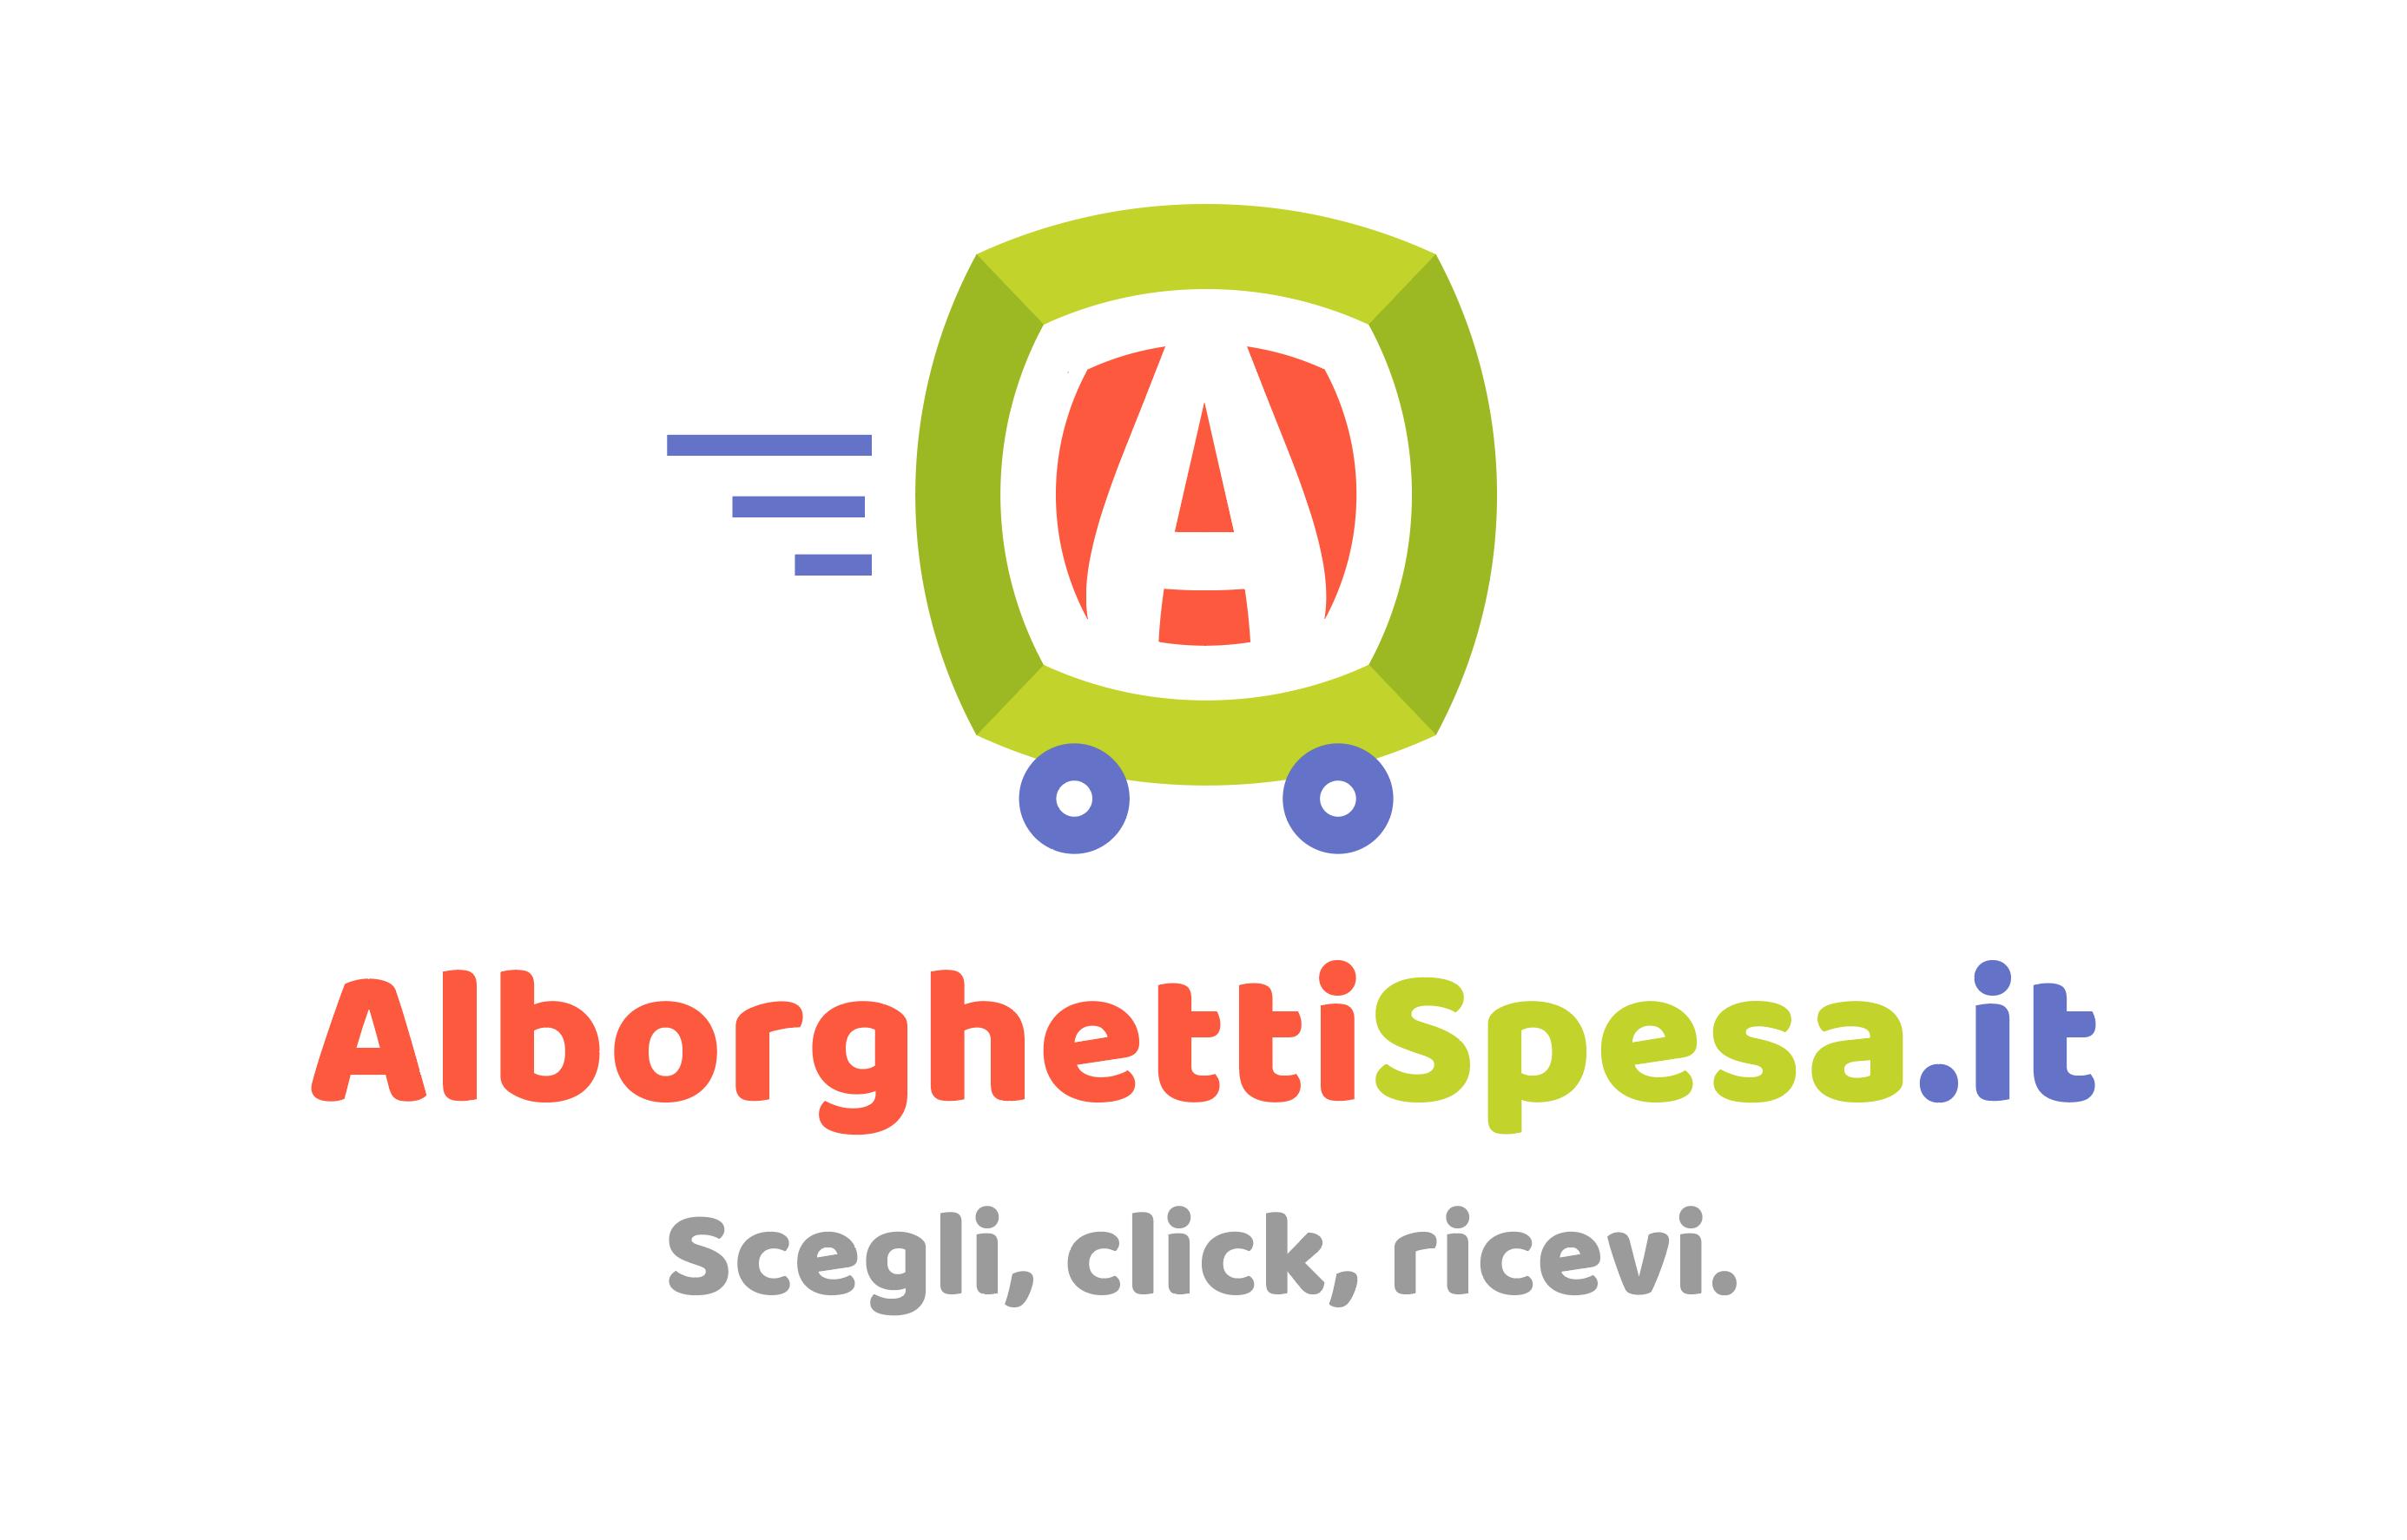 ALBORGHETTISPESA